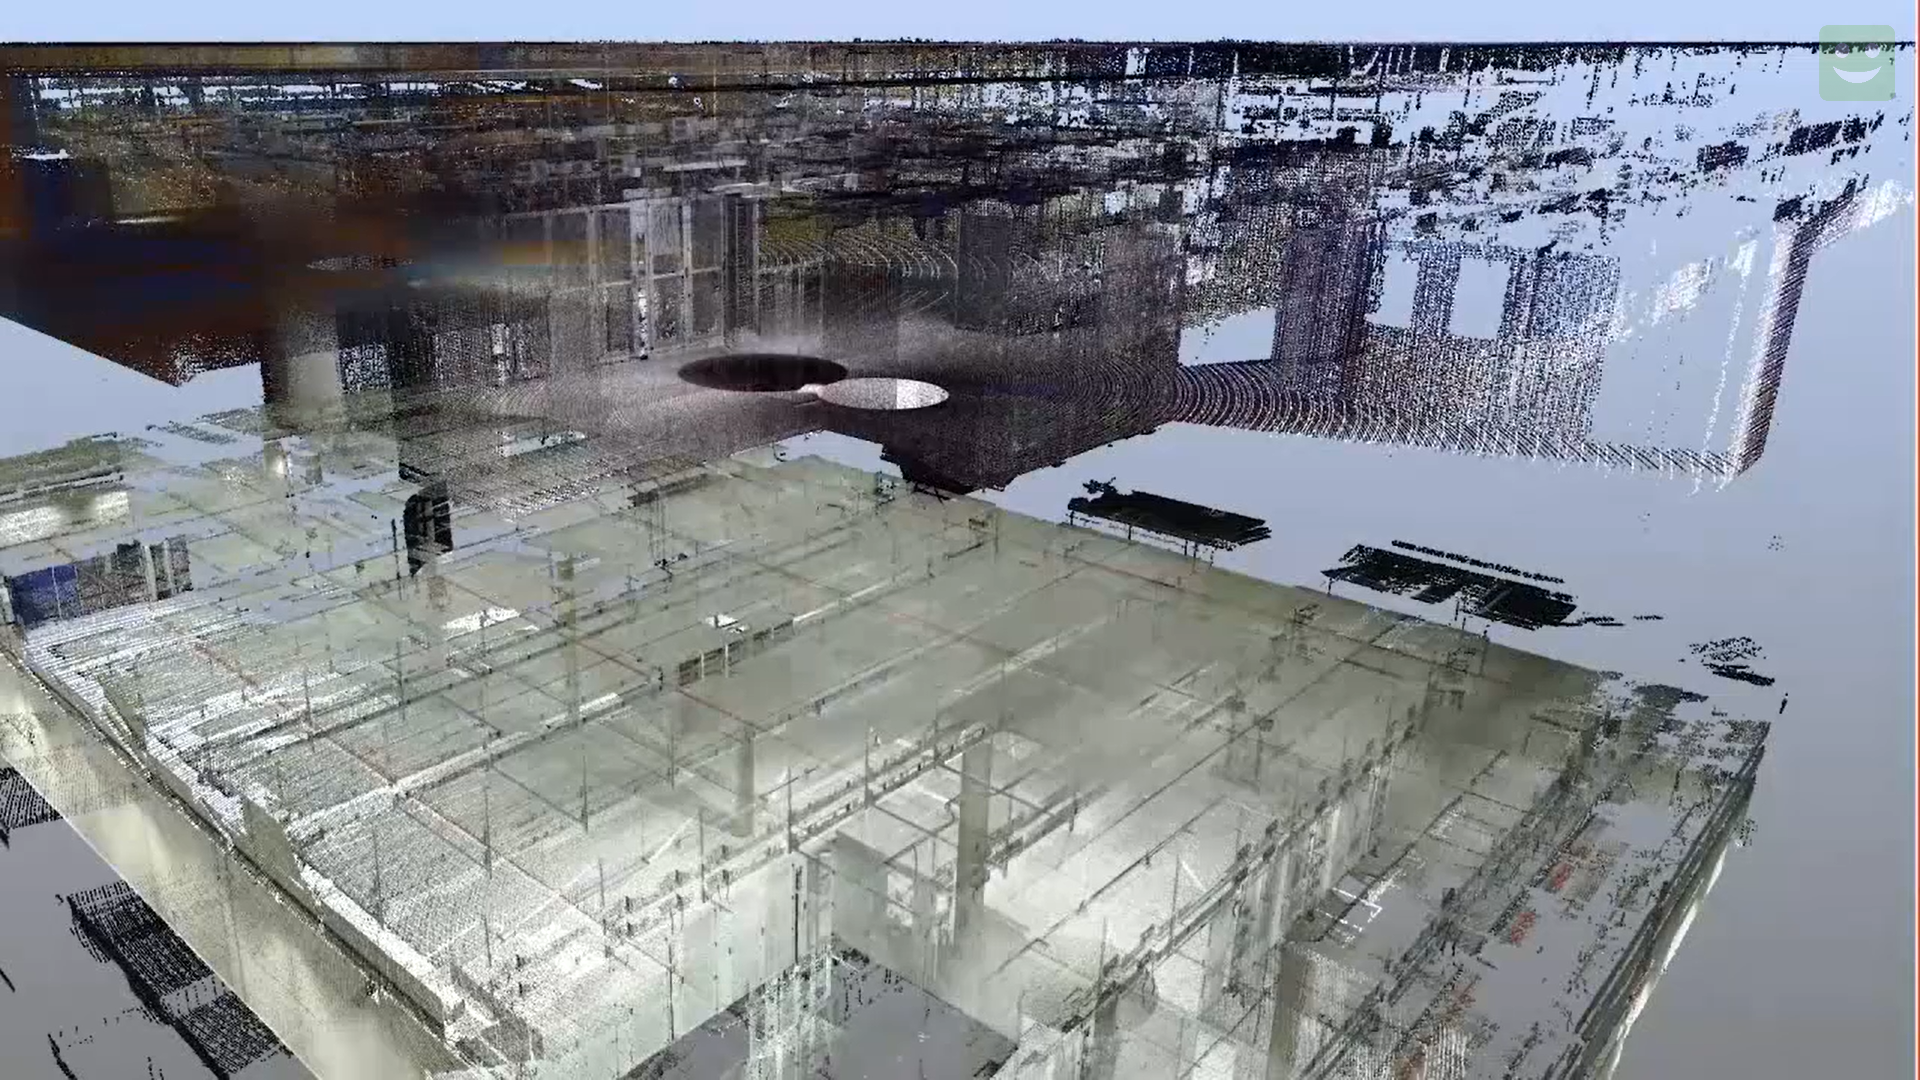 Vertigo STARTS: Artystyczne fascynacje superkomputerami